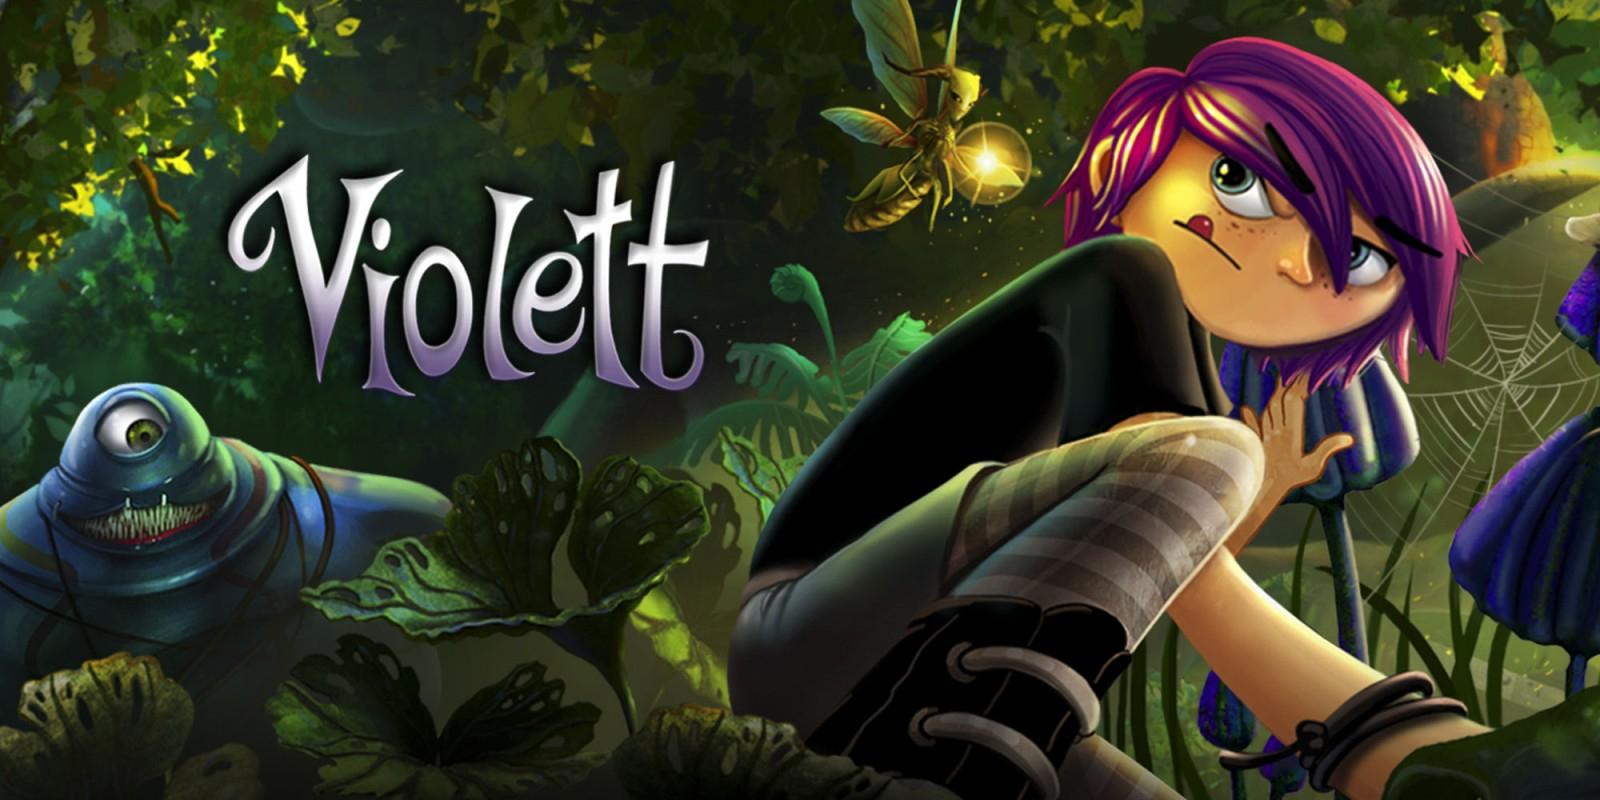 Violett (Nintendo Switch) Download £2.69 @ NintendoEShop